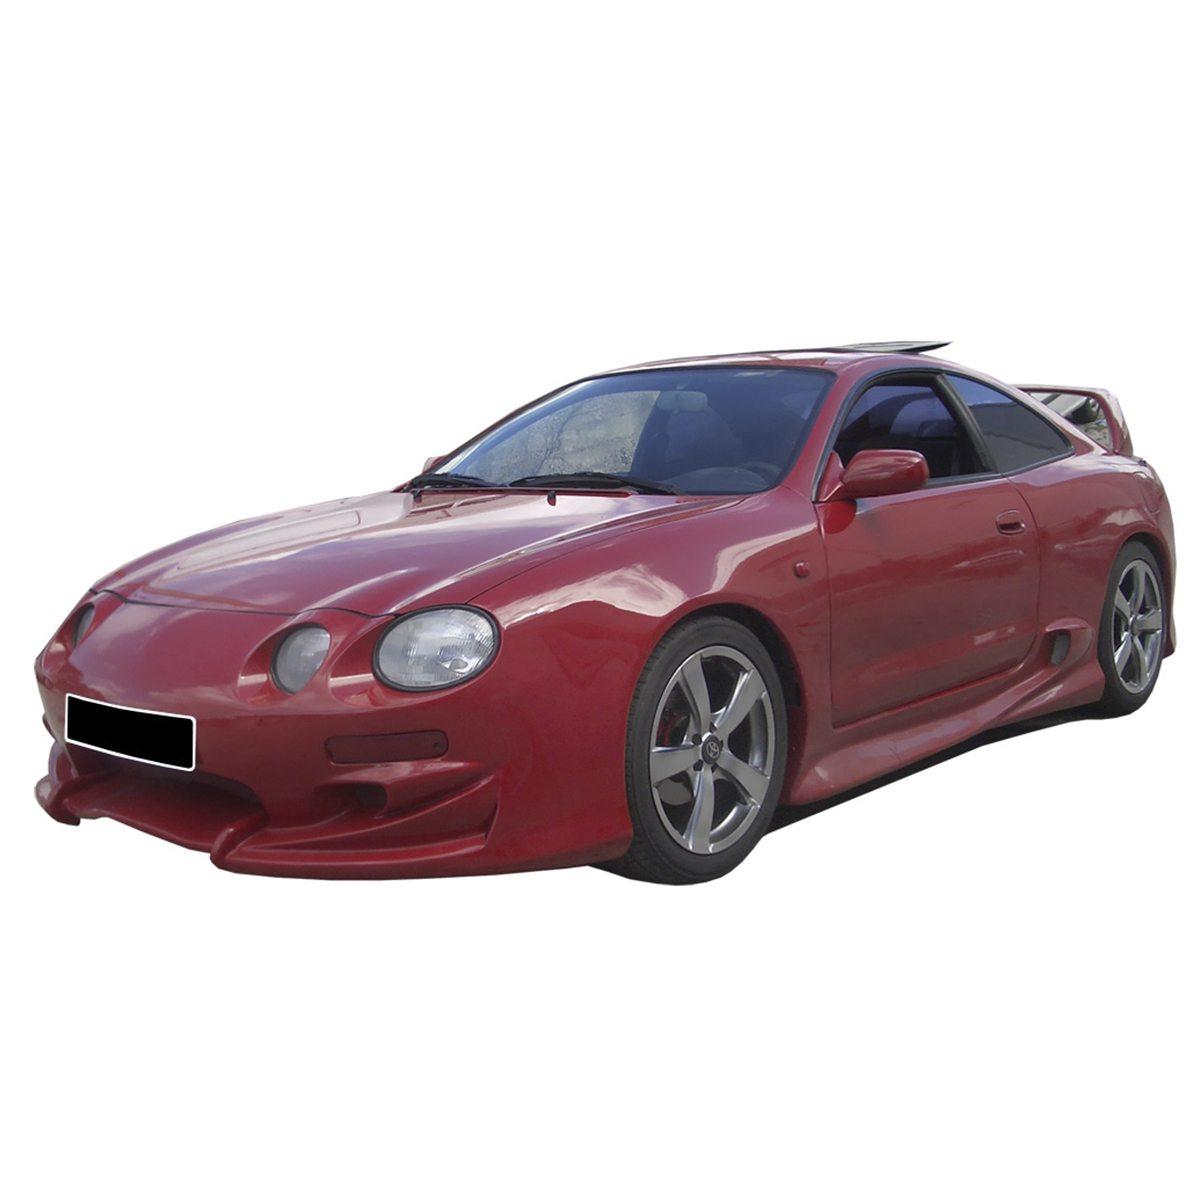 Toyota-Celica-94-Flash-Frt-PCU134.1